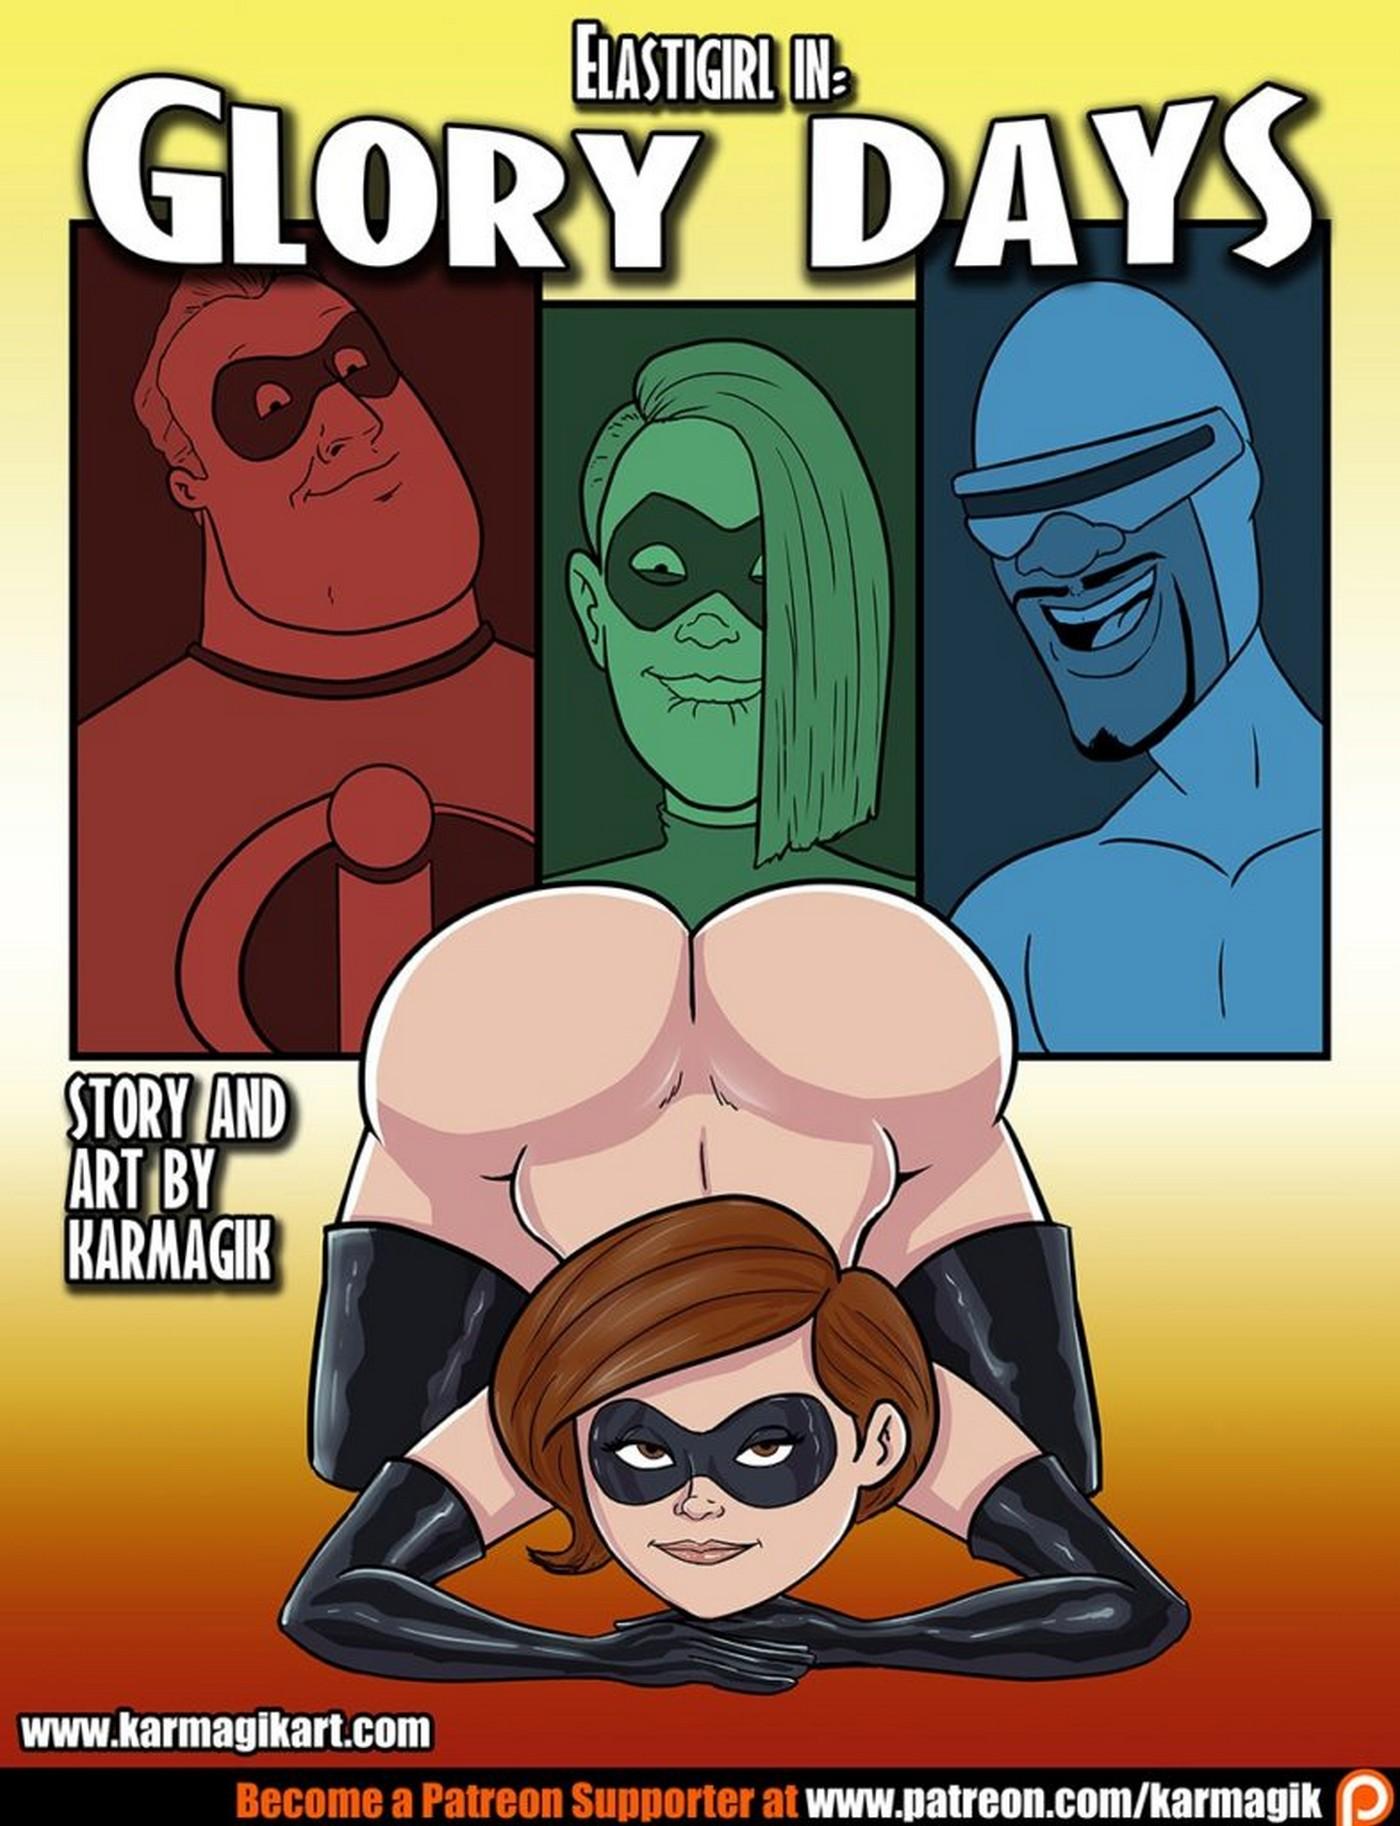 The Incredibles Elastigirl in Glory Days 01